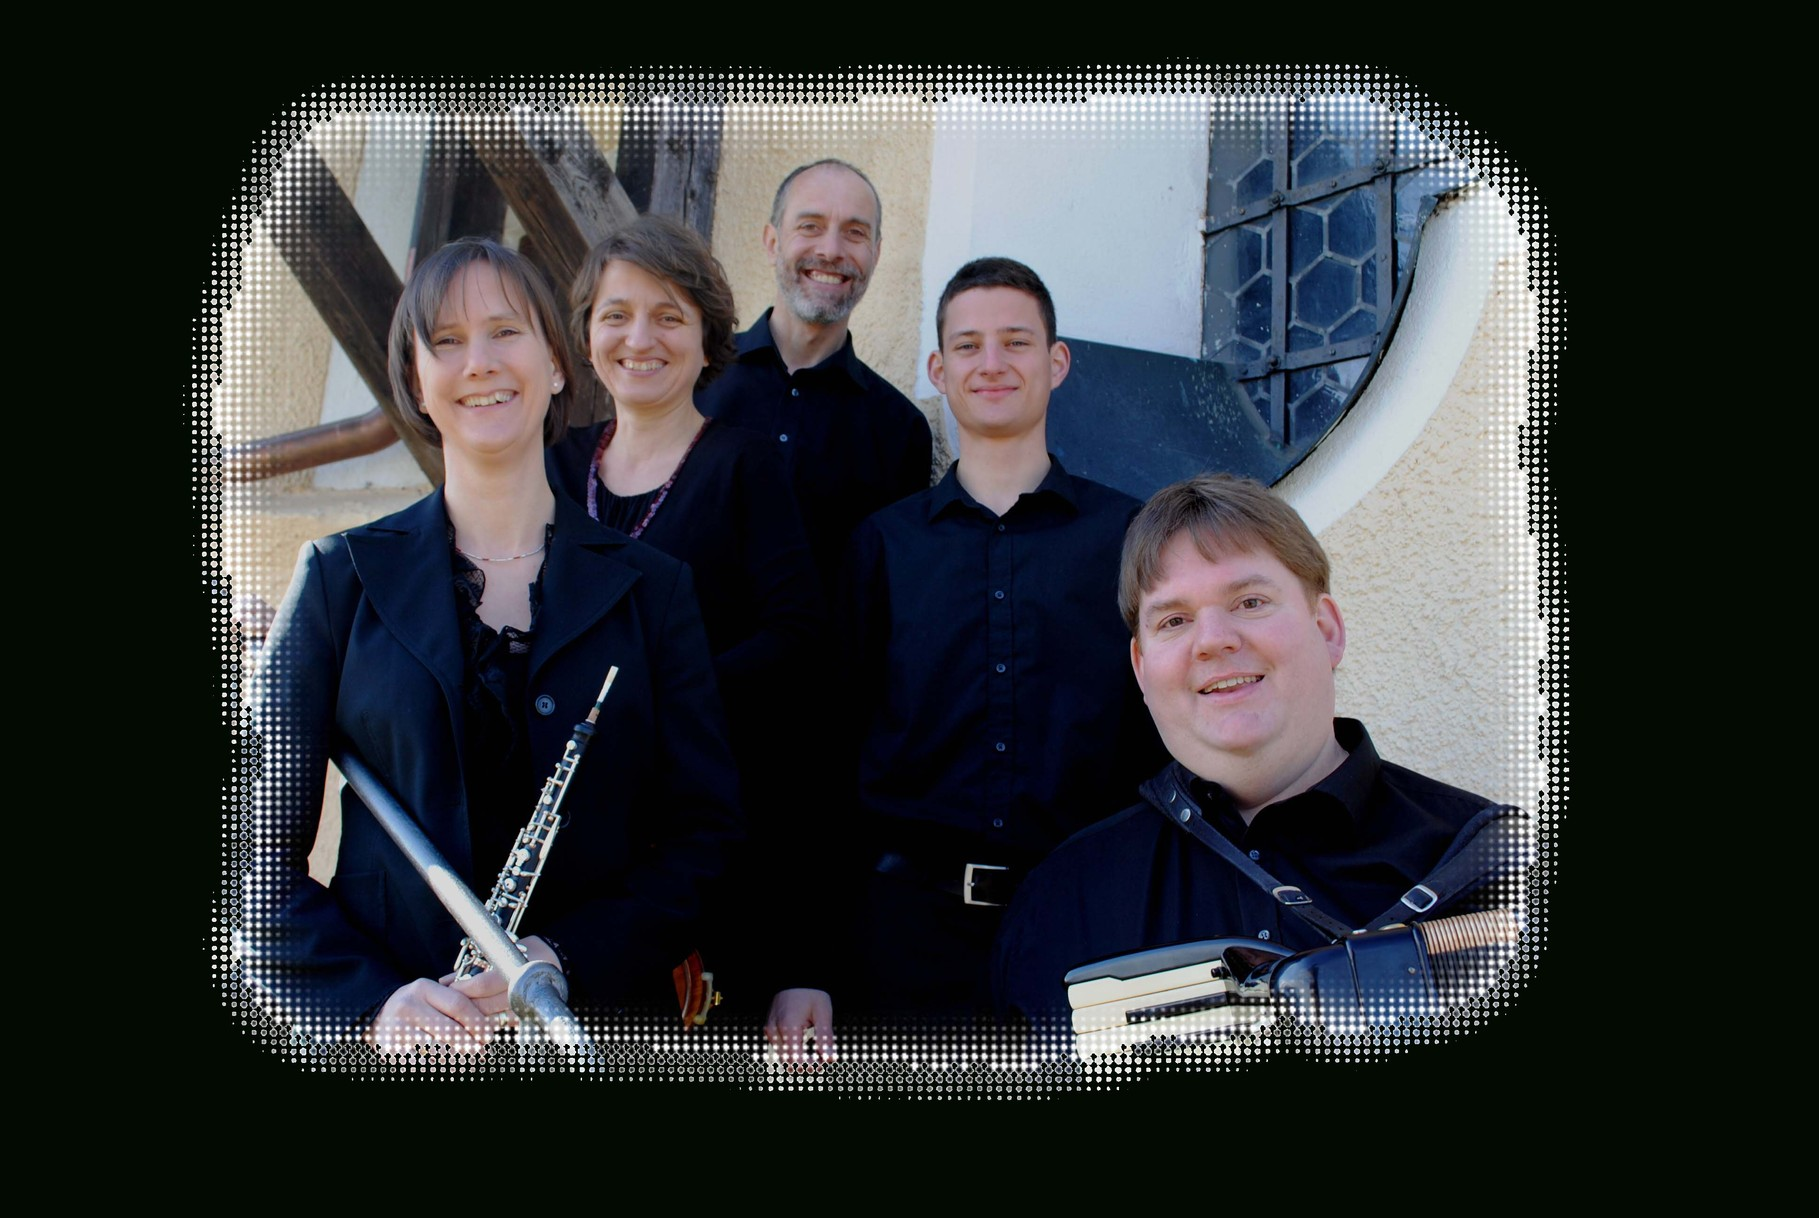 Kammermusik-Ensemble Kohlhauf